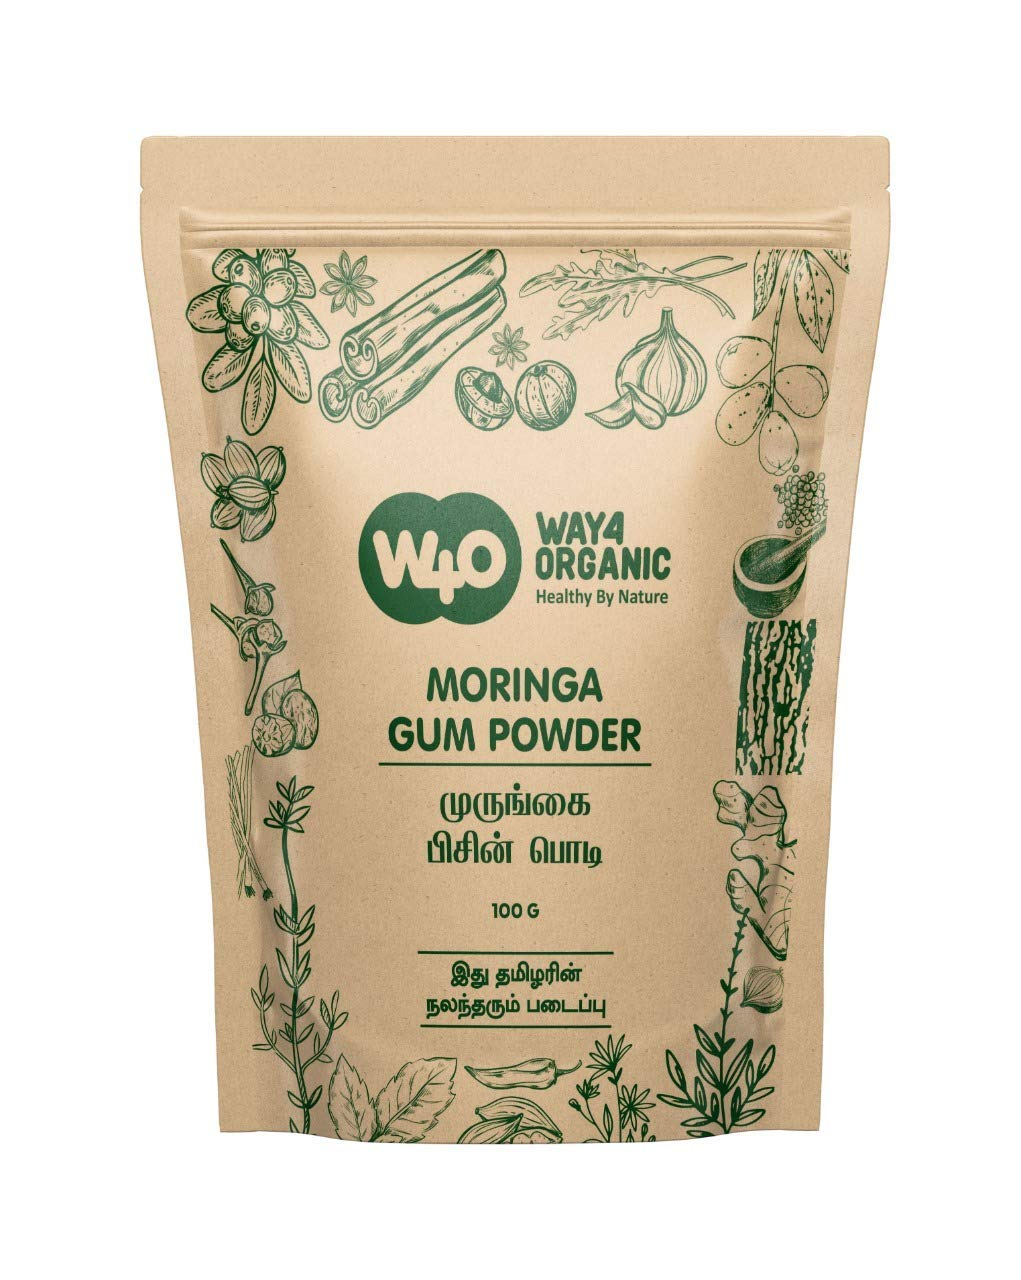 Way4Organic Moringa Gum Powder